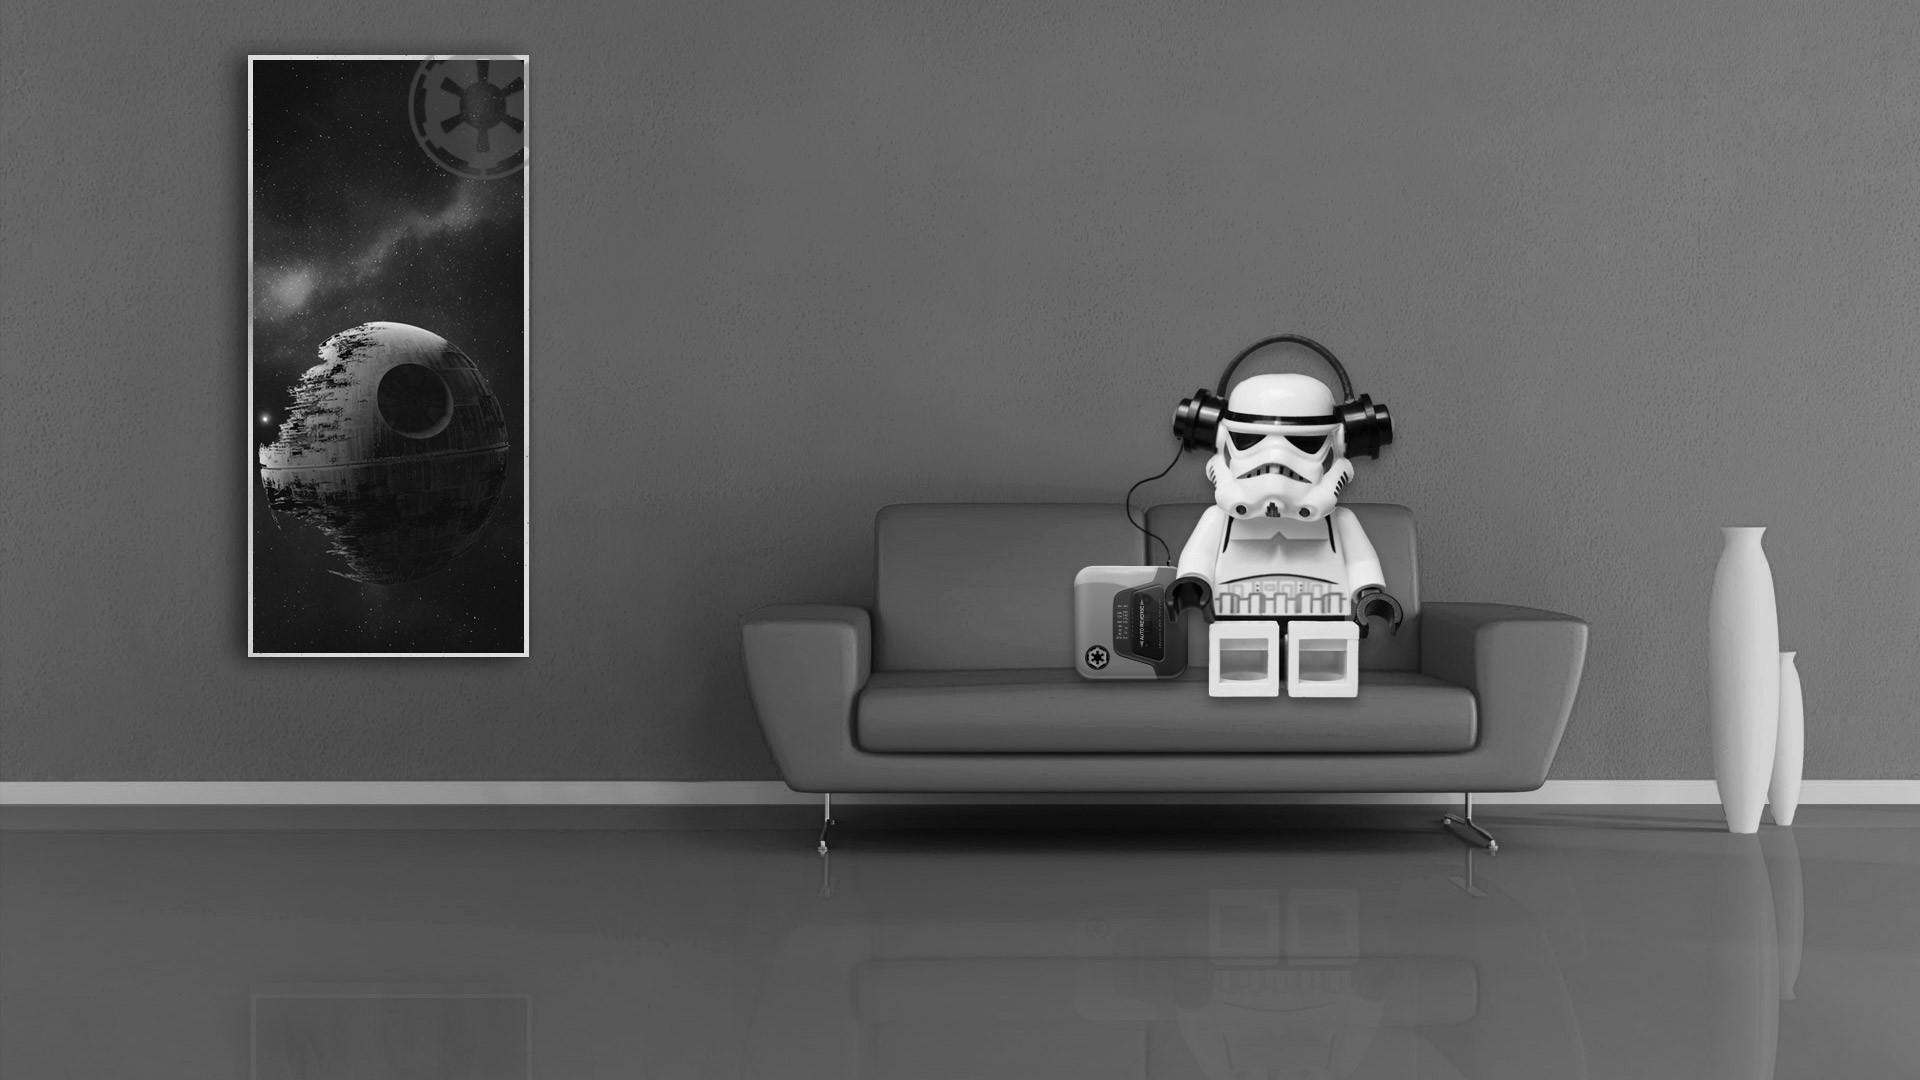 Res: 1920x1080, Stormtrooper Lego Star Wars